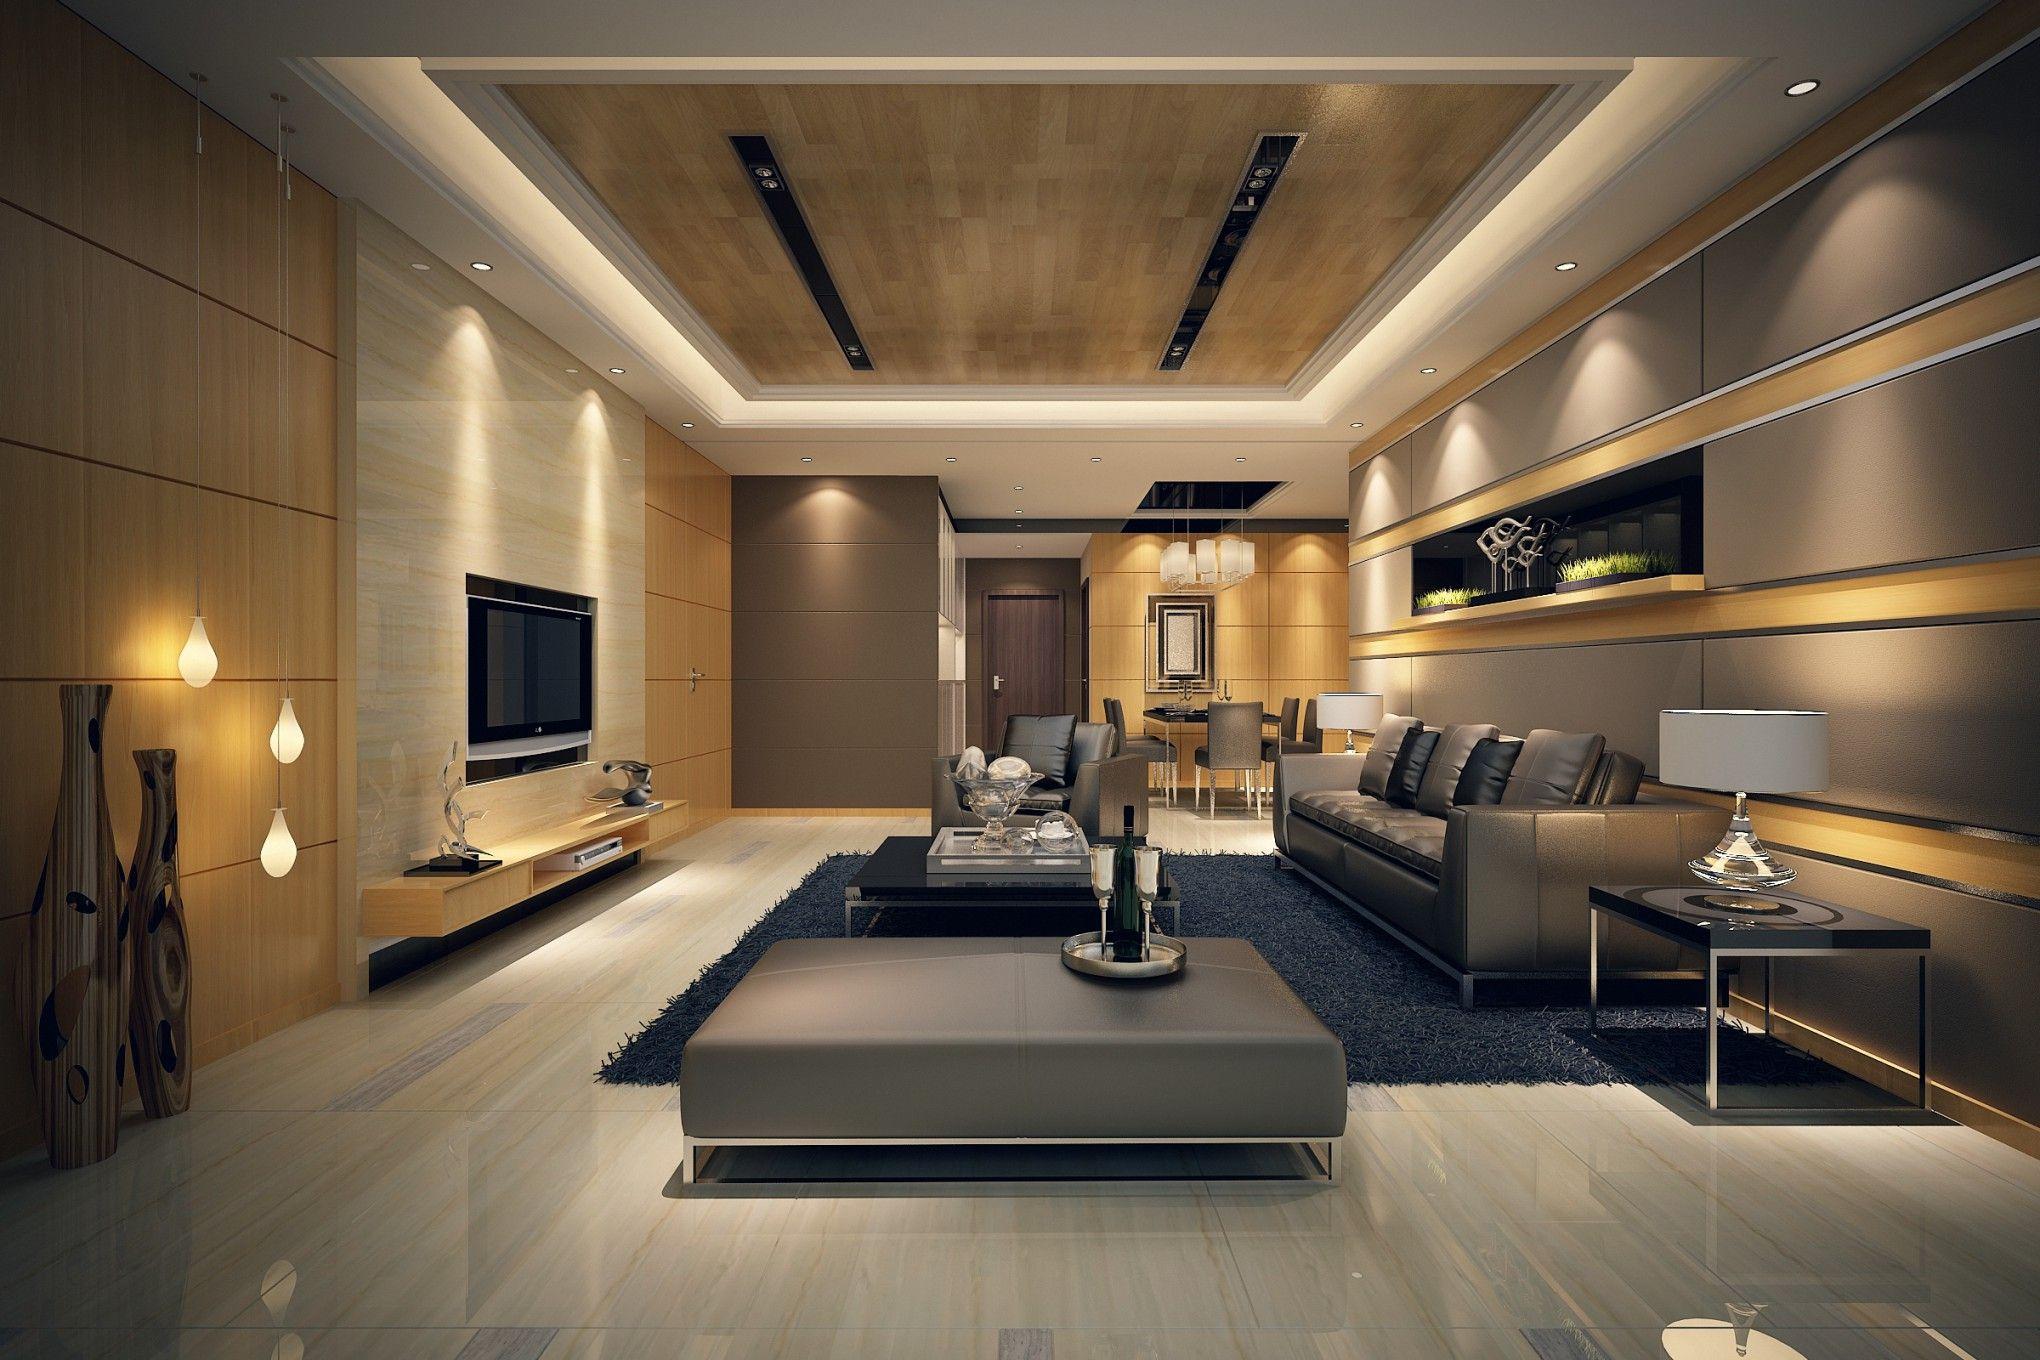 Luxury ultra modern interior design idea in private house [2040x1360]   Modern living room ...